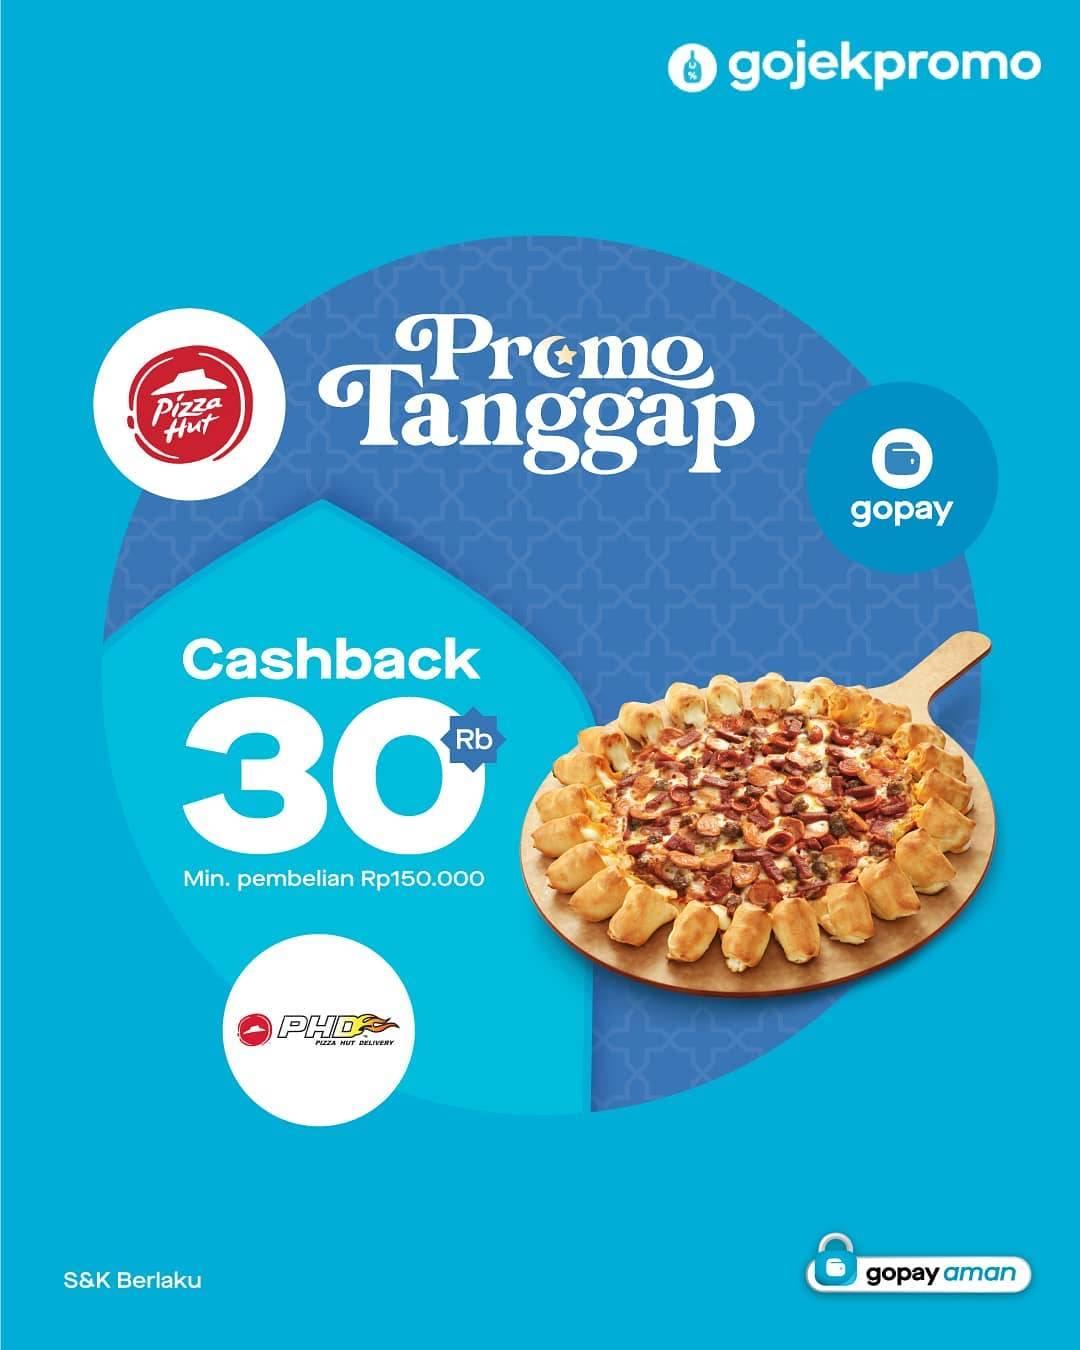 Diskon Pizza Hut Cashback 30% Dengan Gopay